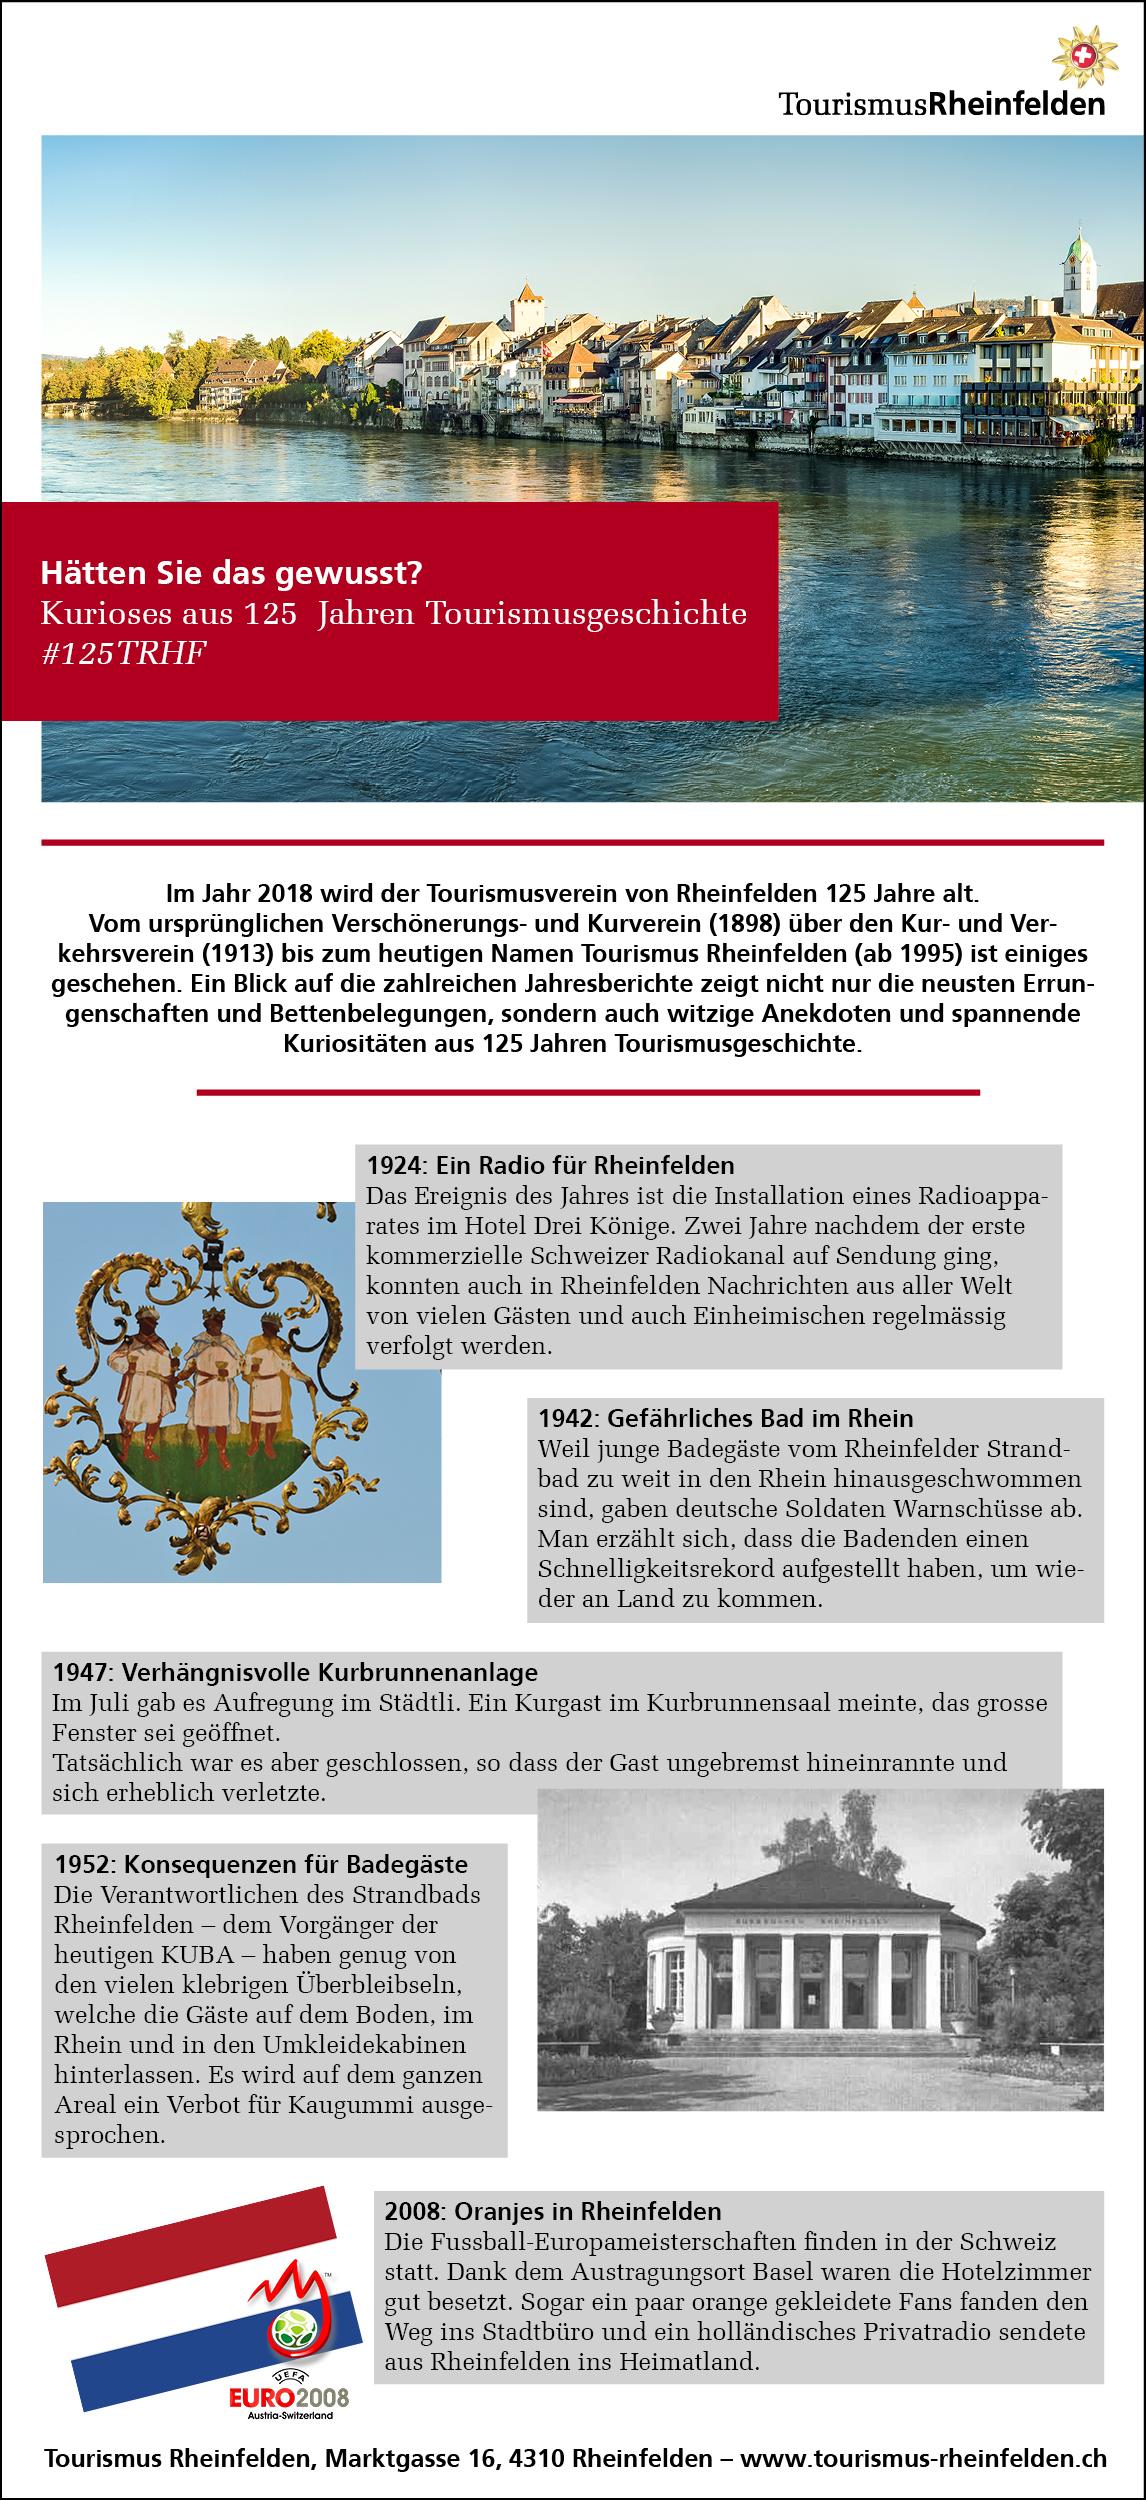 Listicle: Kurioses aus Rheinfelden